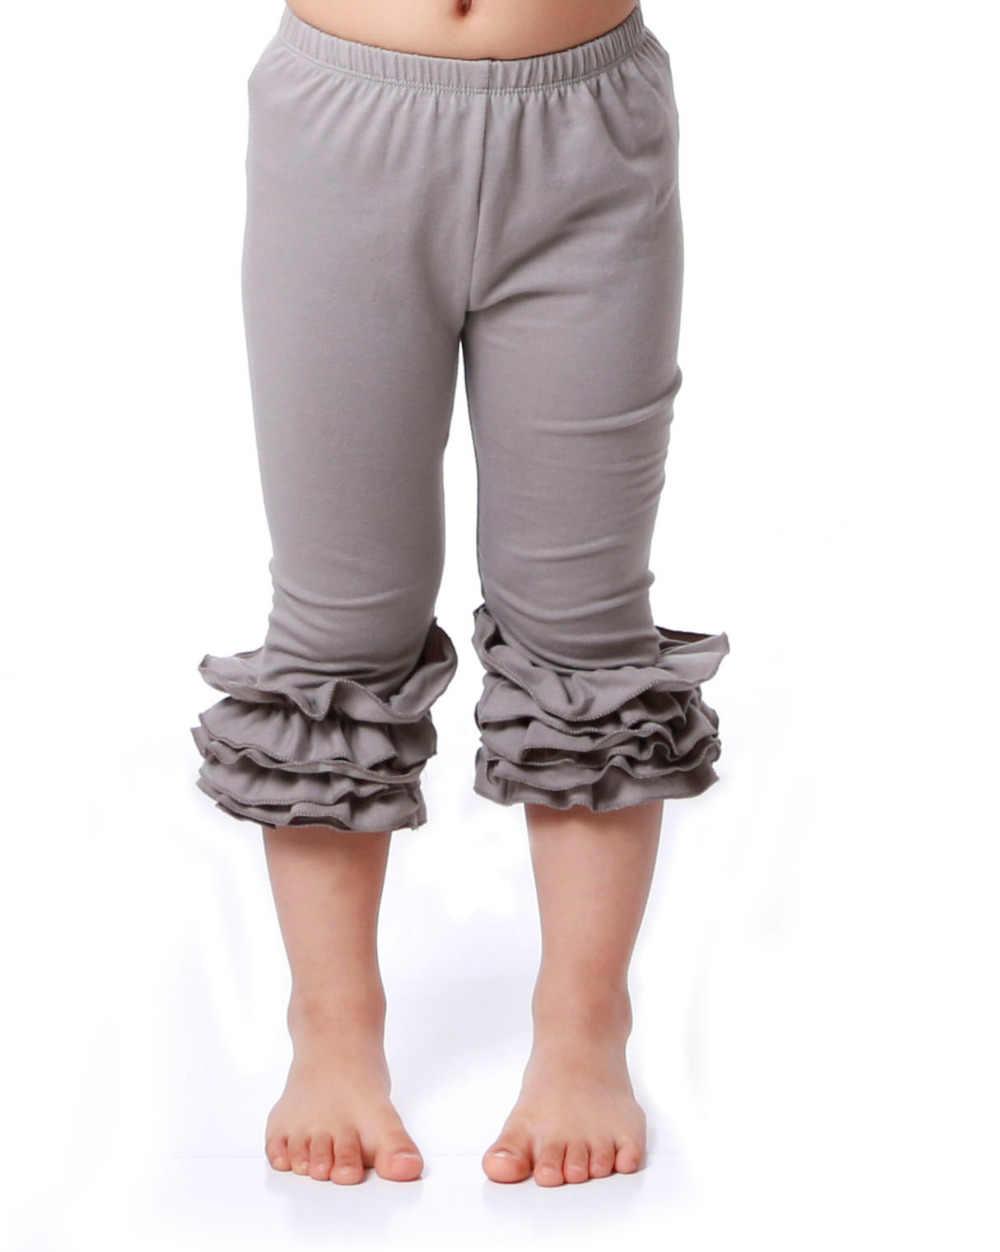 5551d45dfdfb9 ... Hot Sale Girls Capri Leggings Ruffle Pants Toddler Girl Clothing Posh  Cotton Pants Girl Ruffles Leggings ...